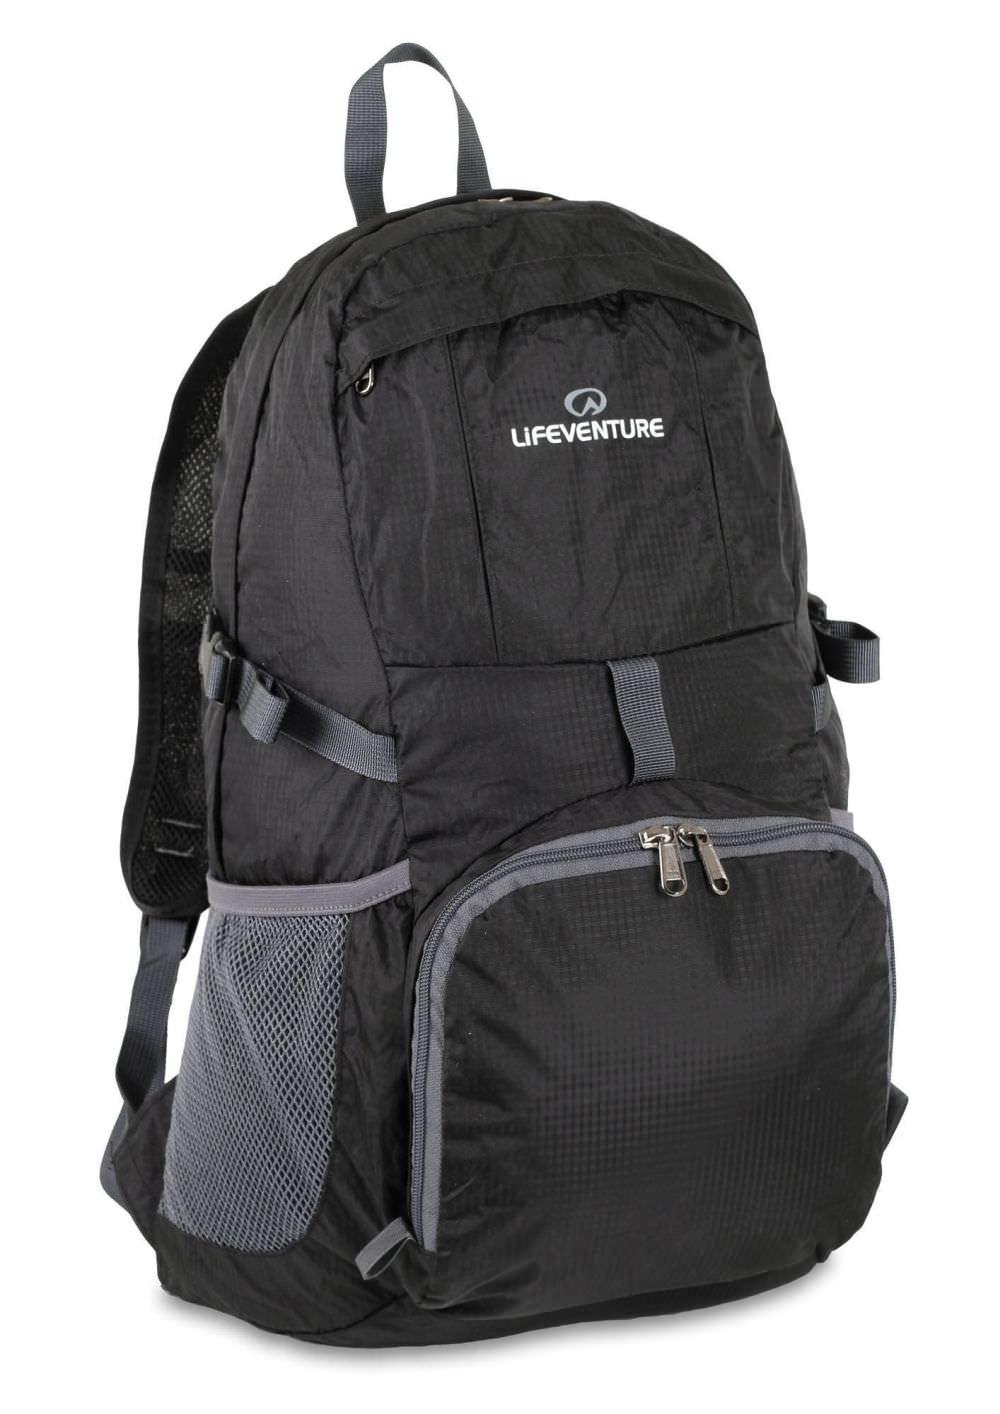 Lifeventure Daypack 18 Liter - faltbarer Rucksack